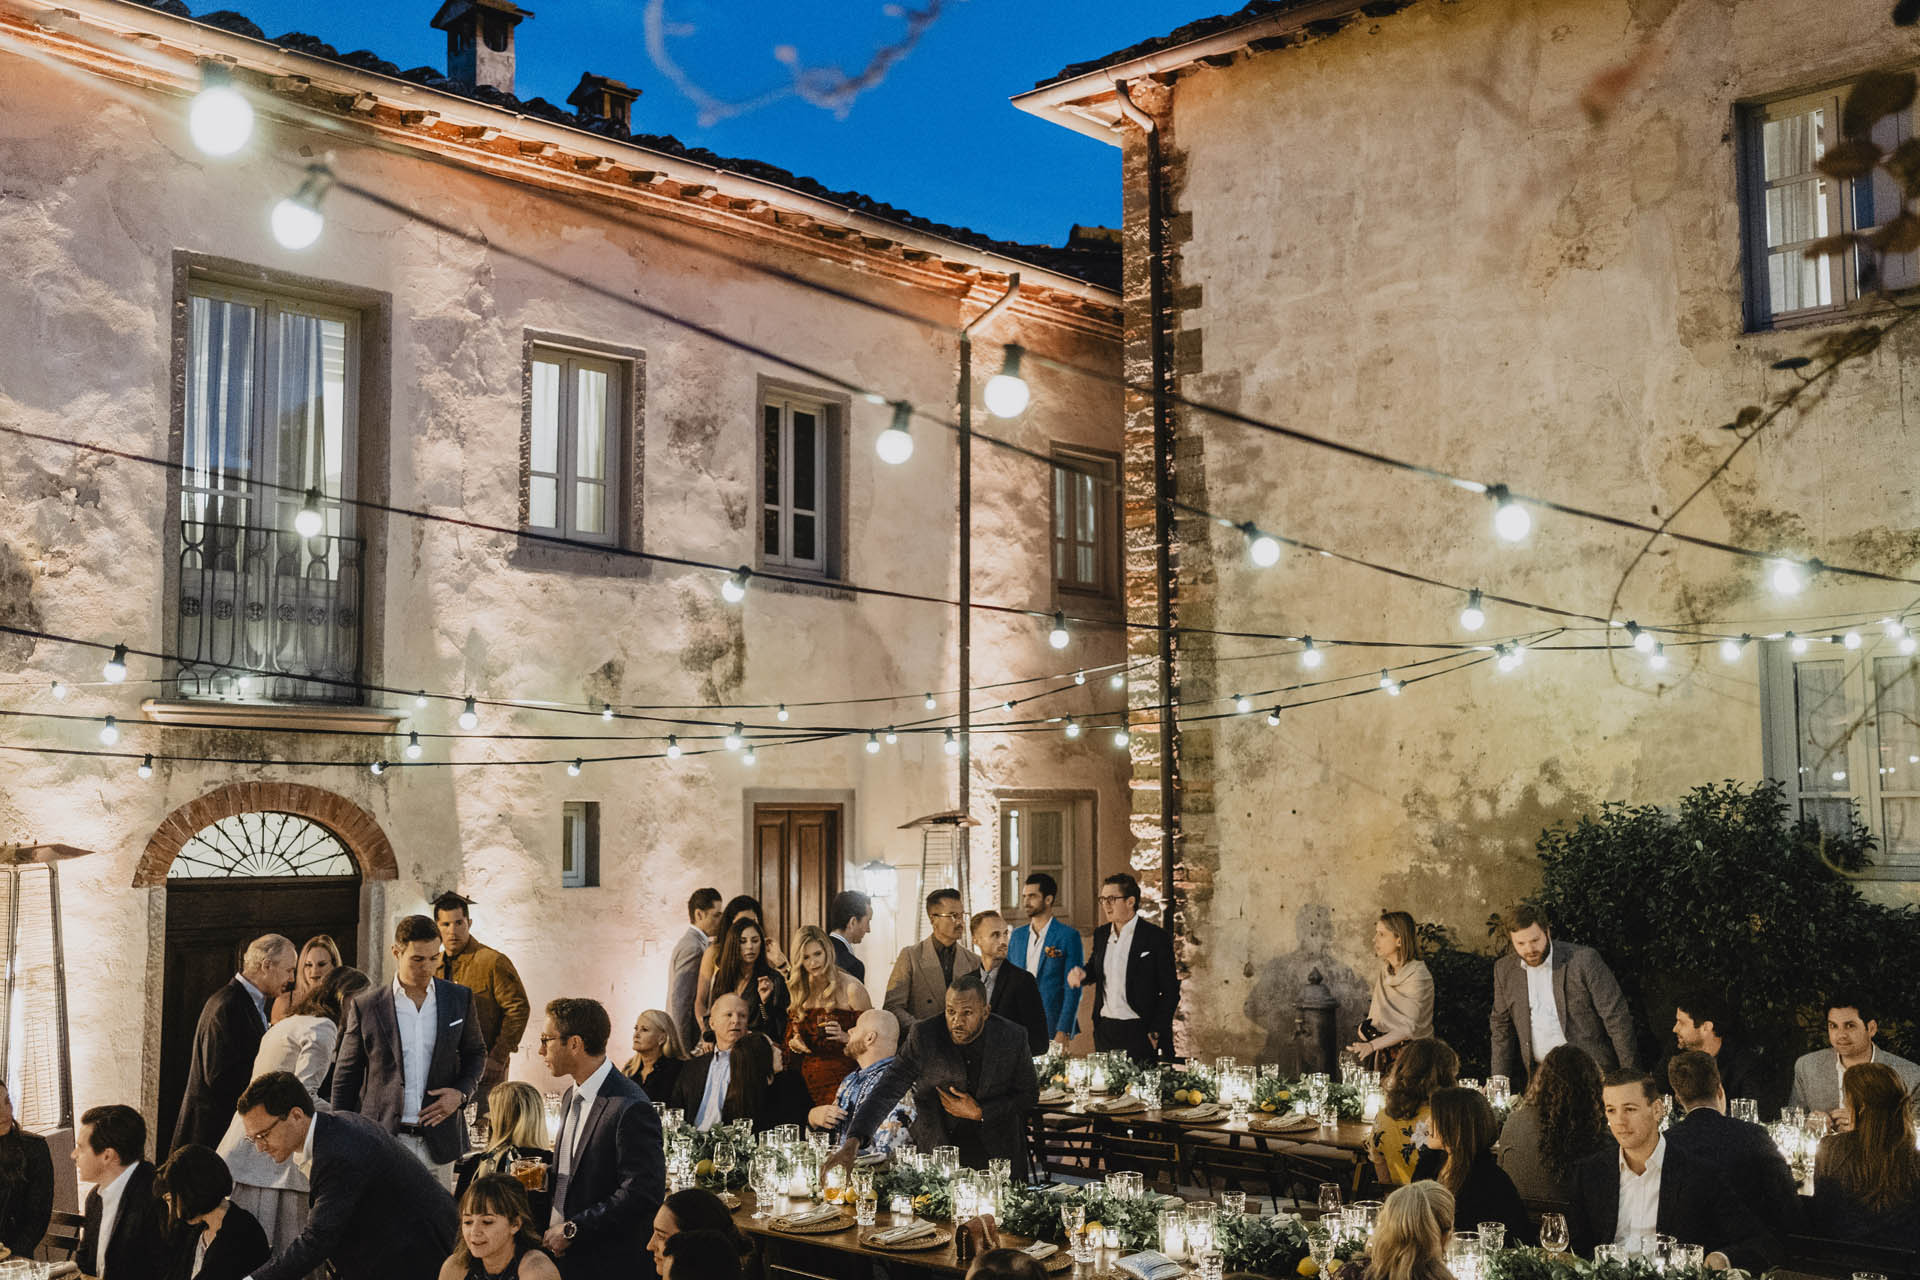 - 15 :: Intimate elegance: an intimate wedding at Il Borro :: Luxury wedding photography - 14 ::  - 15